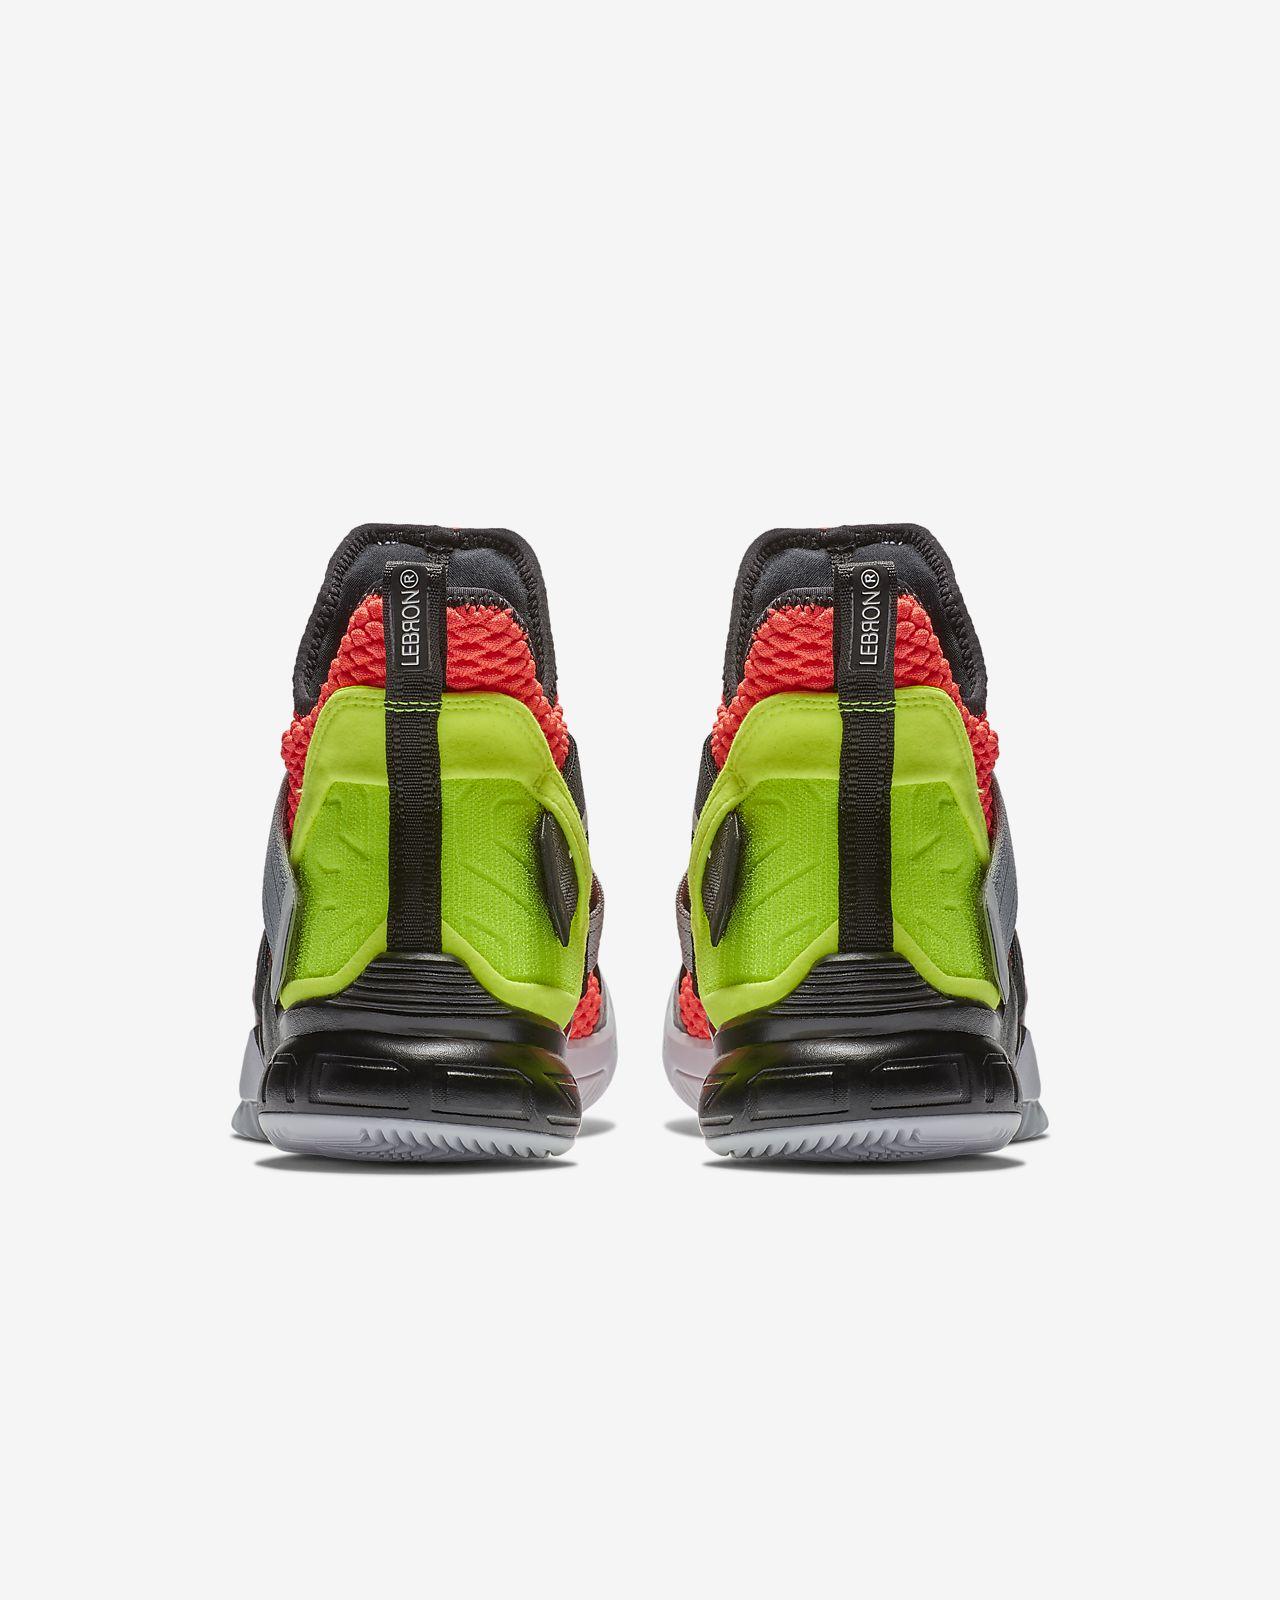 timeless design 4e2b6 9997e LeBron Soldier 12 SFG Basketball Shoe